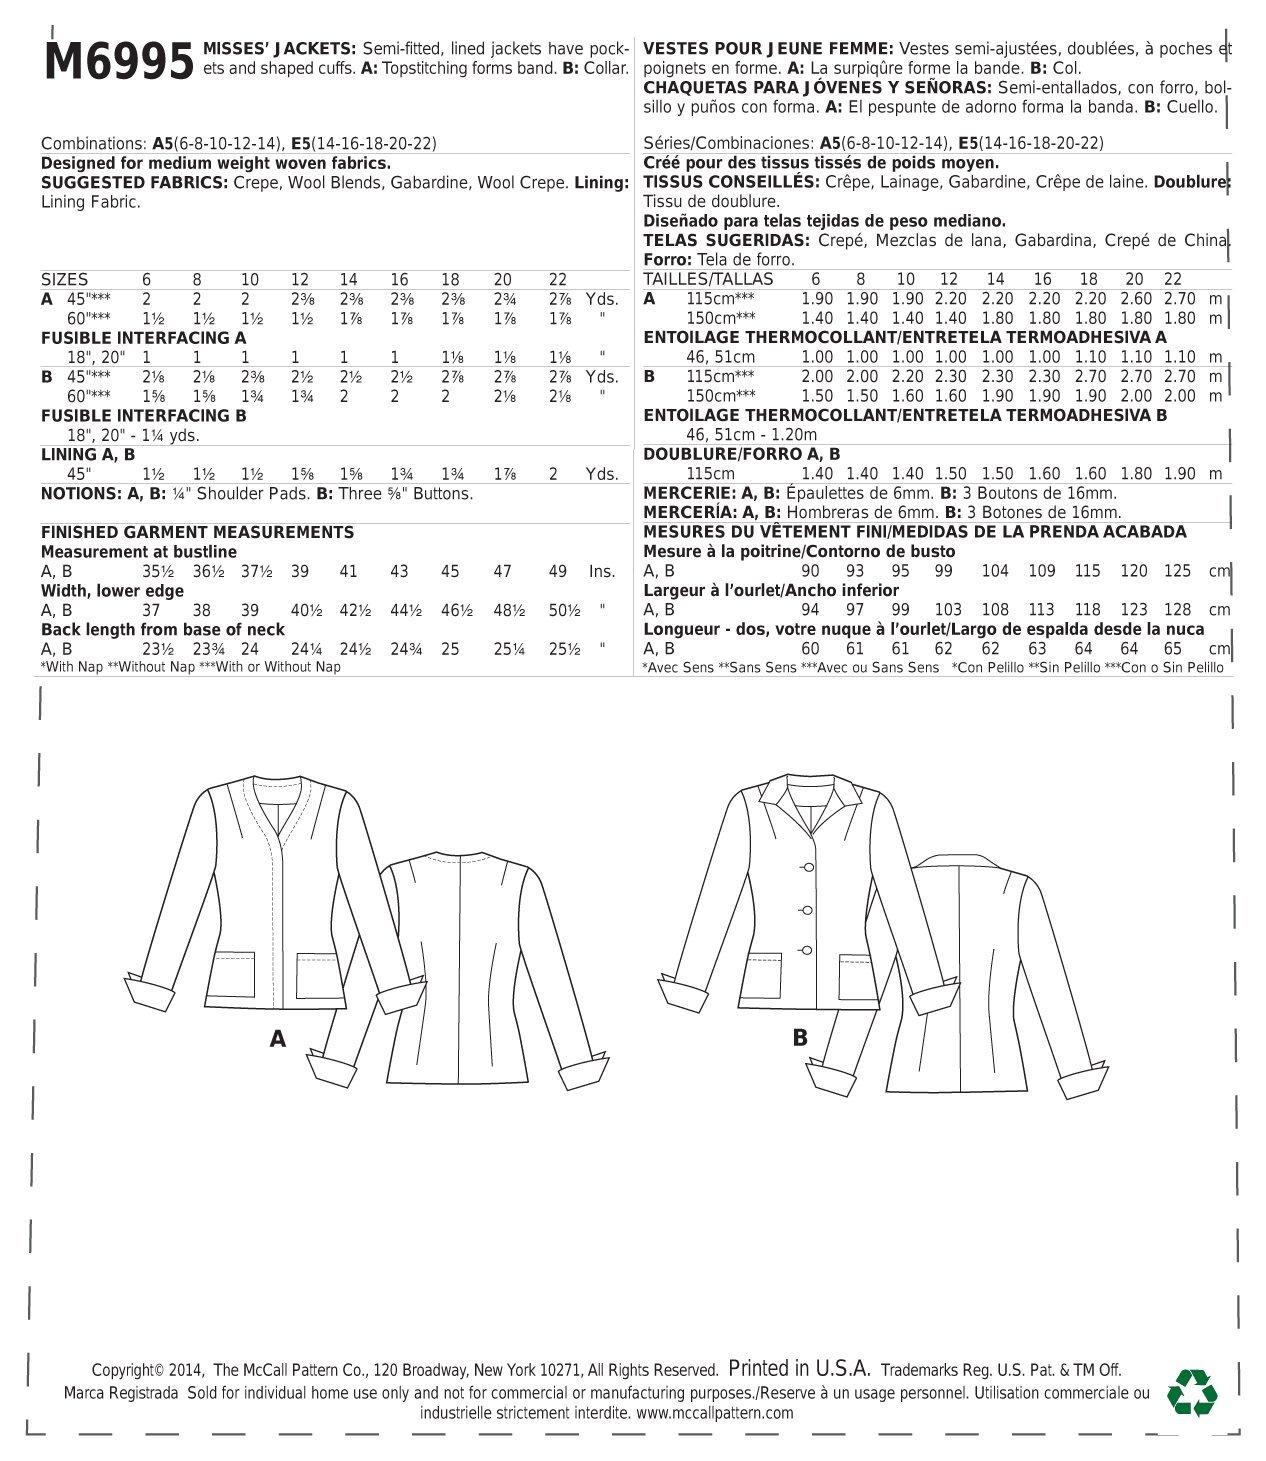 Amazon.com: McCall Pattern Company M6995 Misses Jackets, Size E5 (14-16-18-20-22)